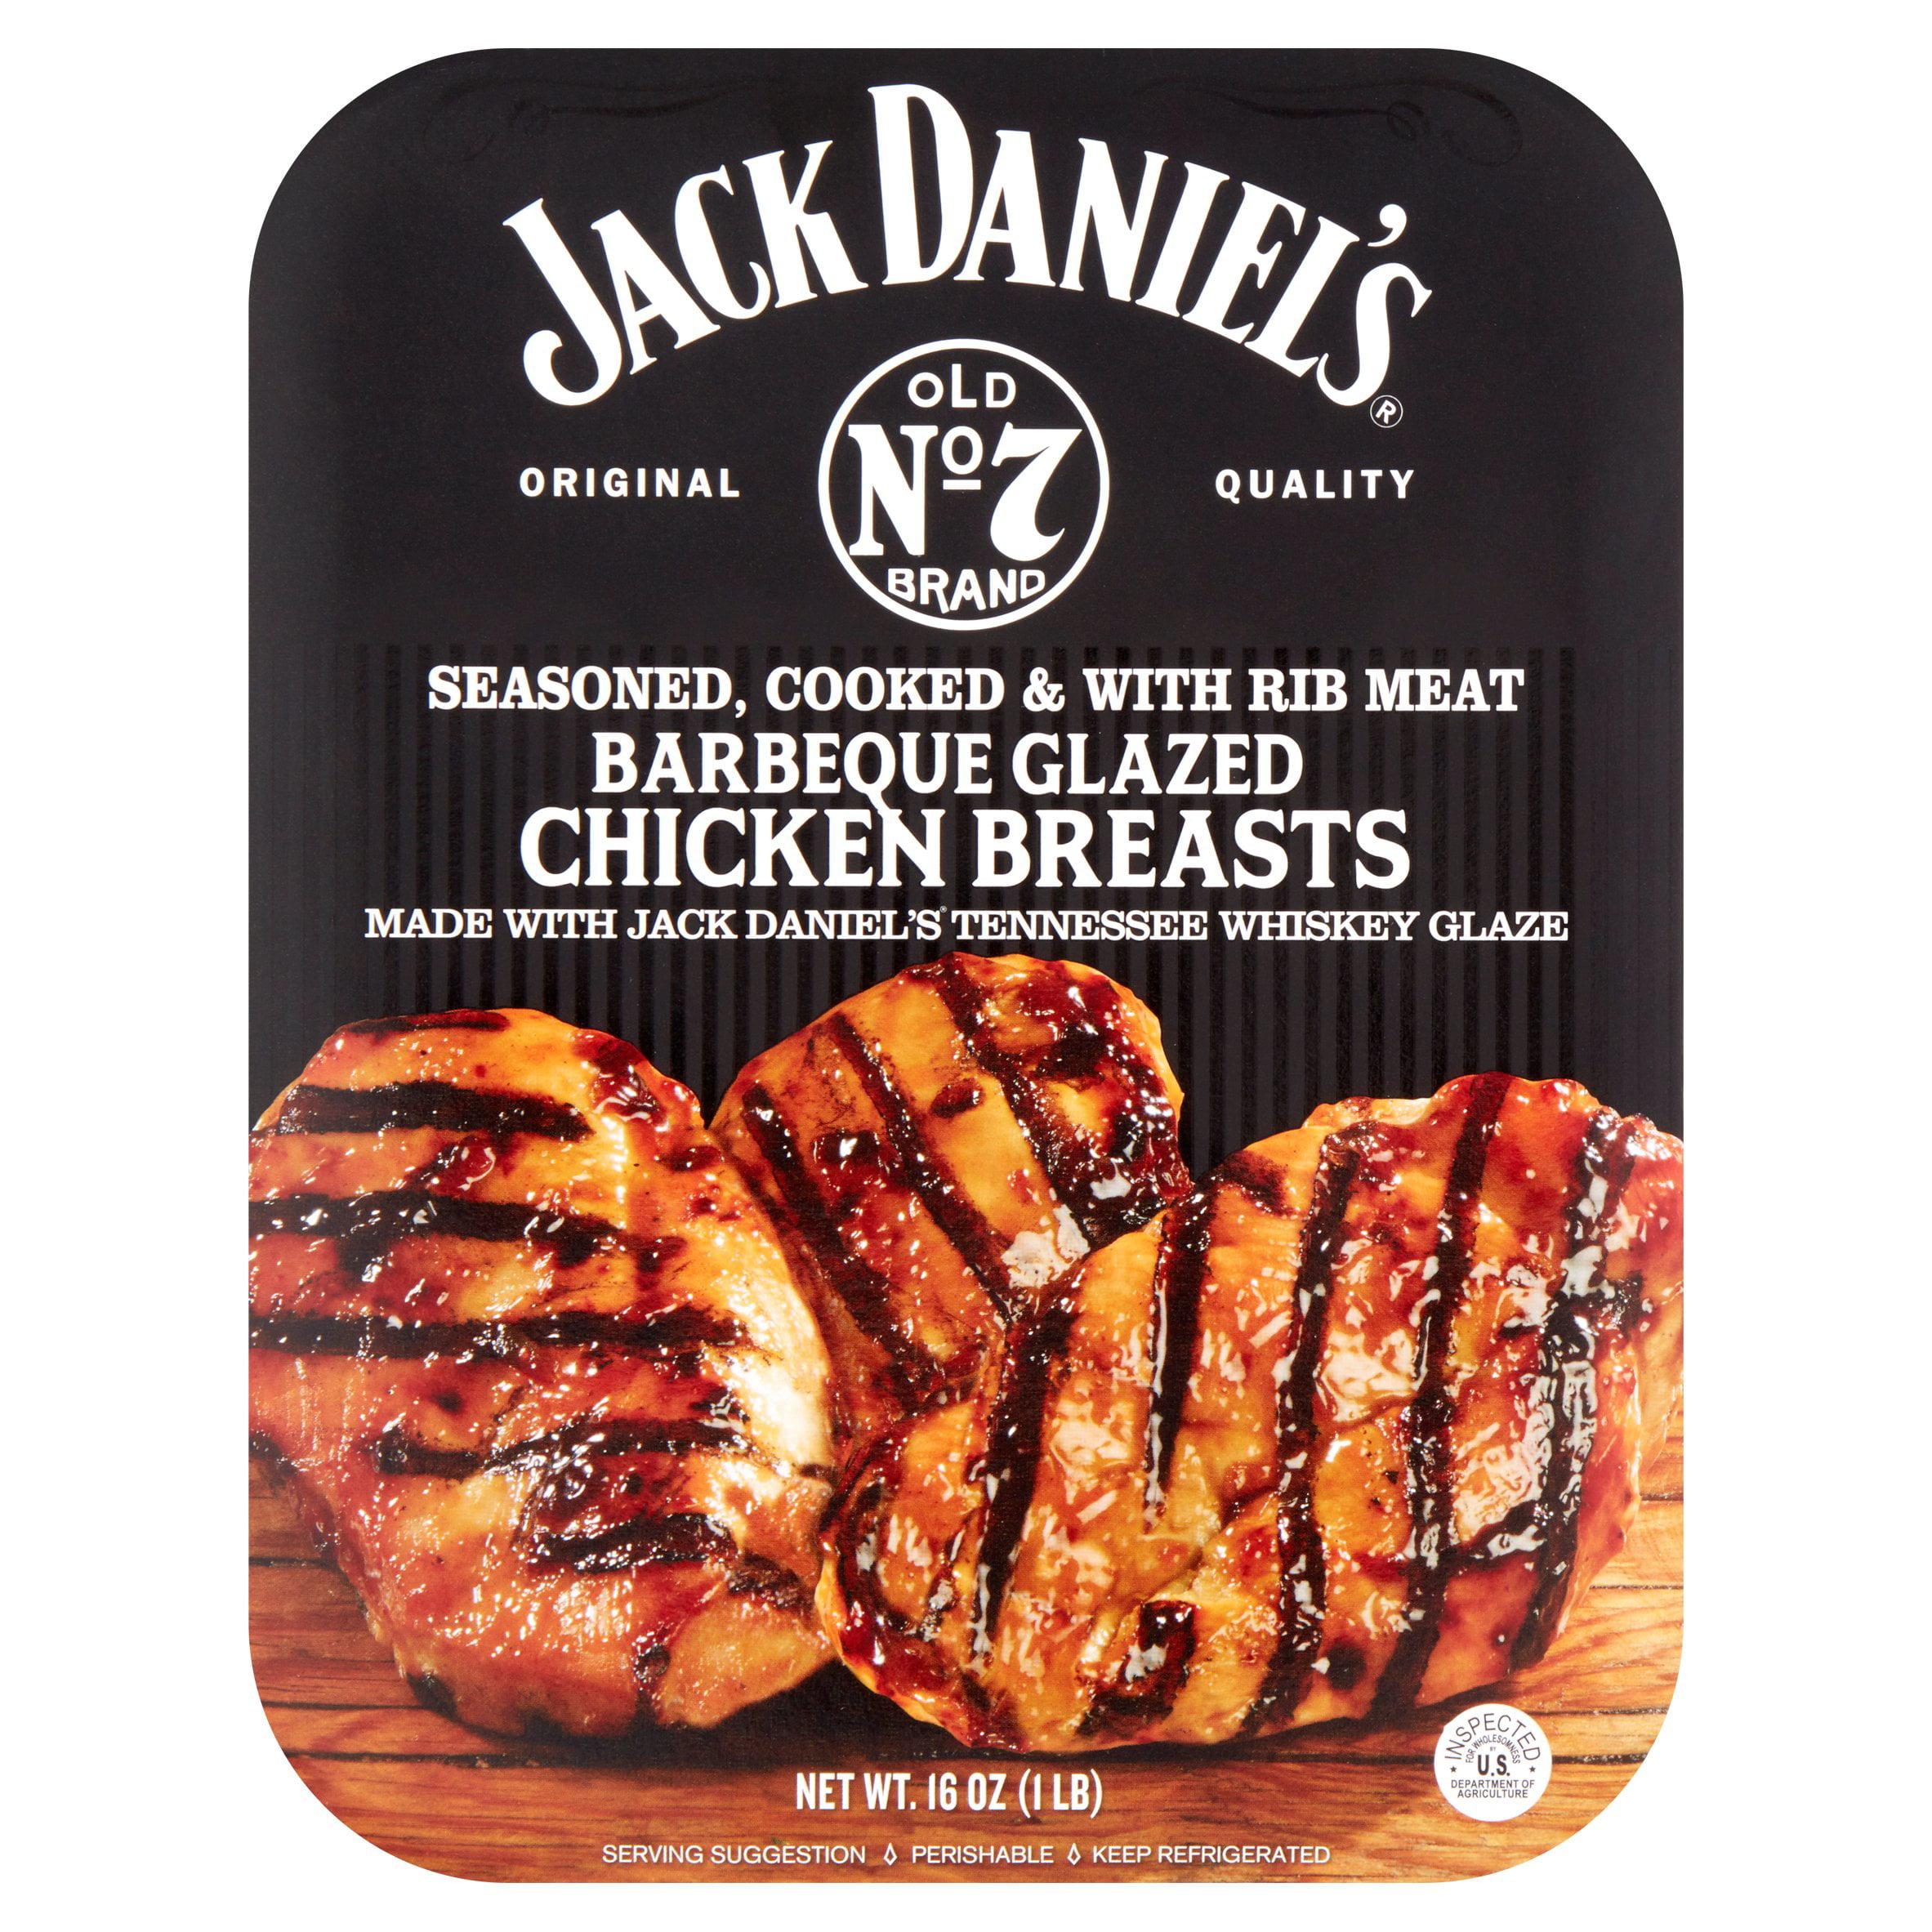 Jack Daniel's Old No 7 Brand Barbeque Glazed Chicken Breasts, 16 oz